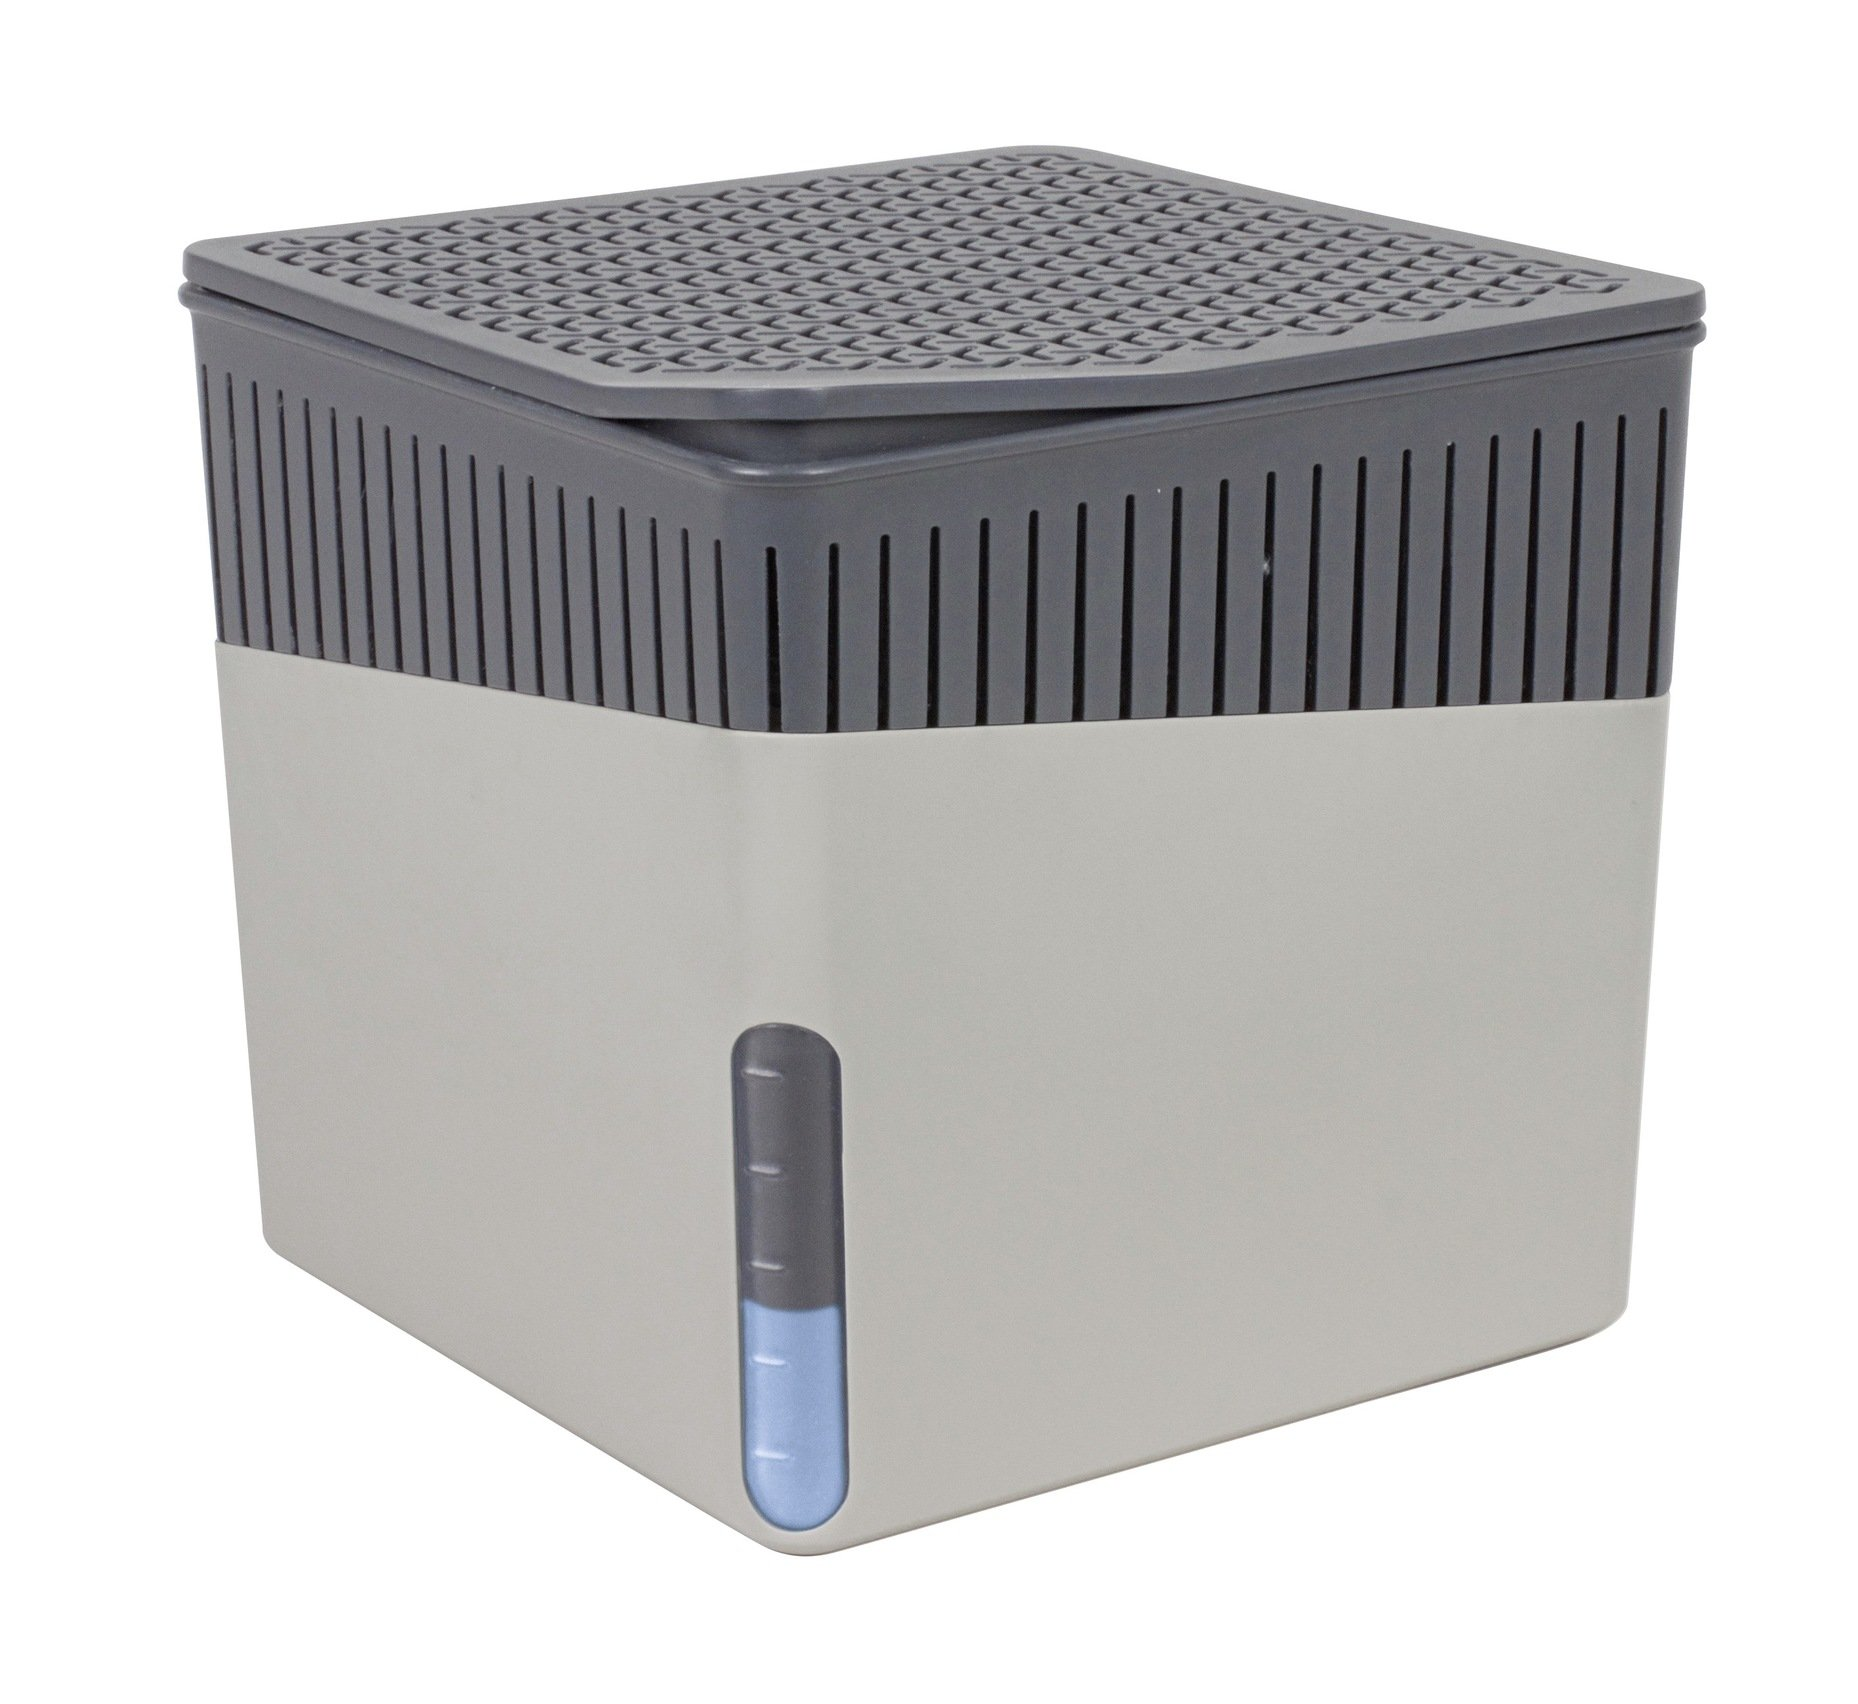 WENKO Cube Dehumidifier, Grey